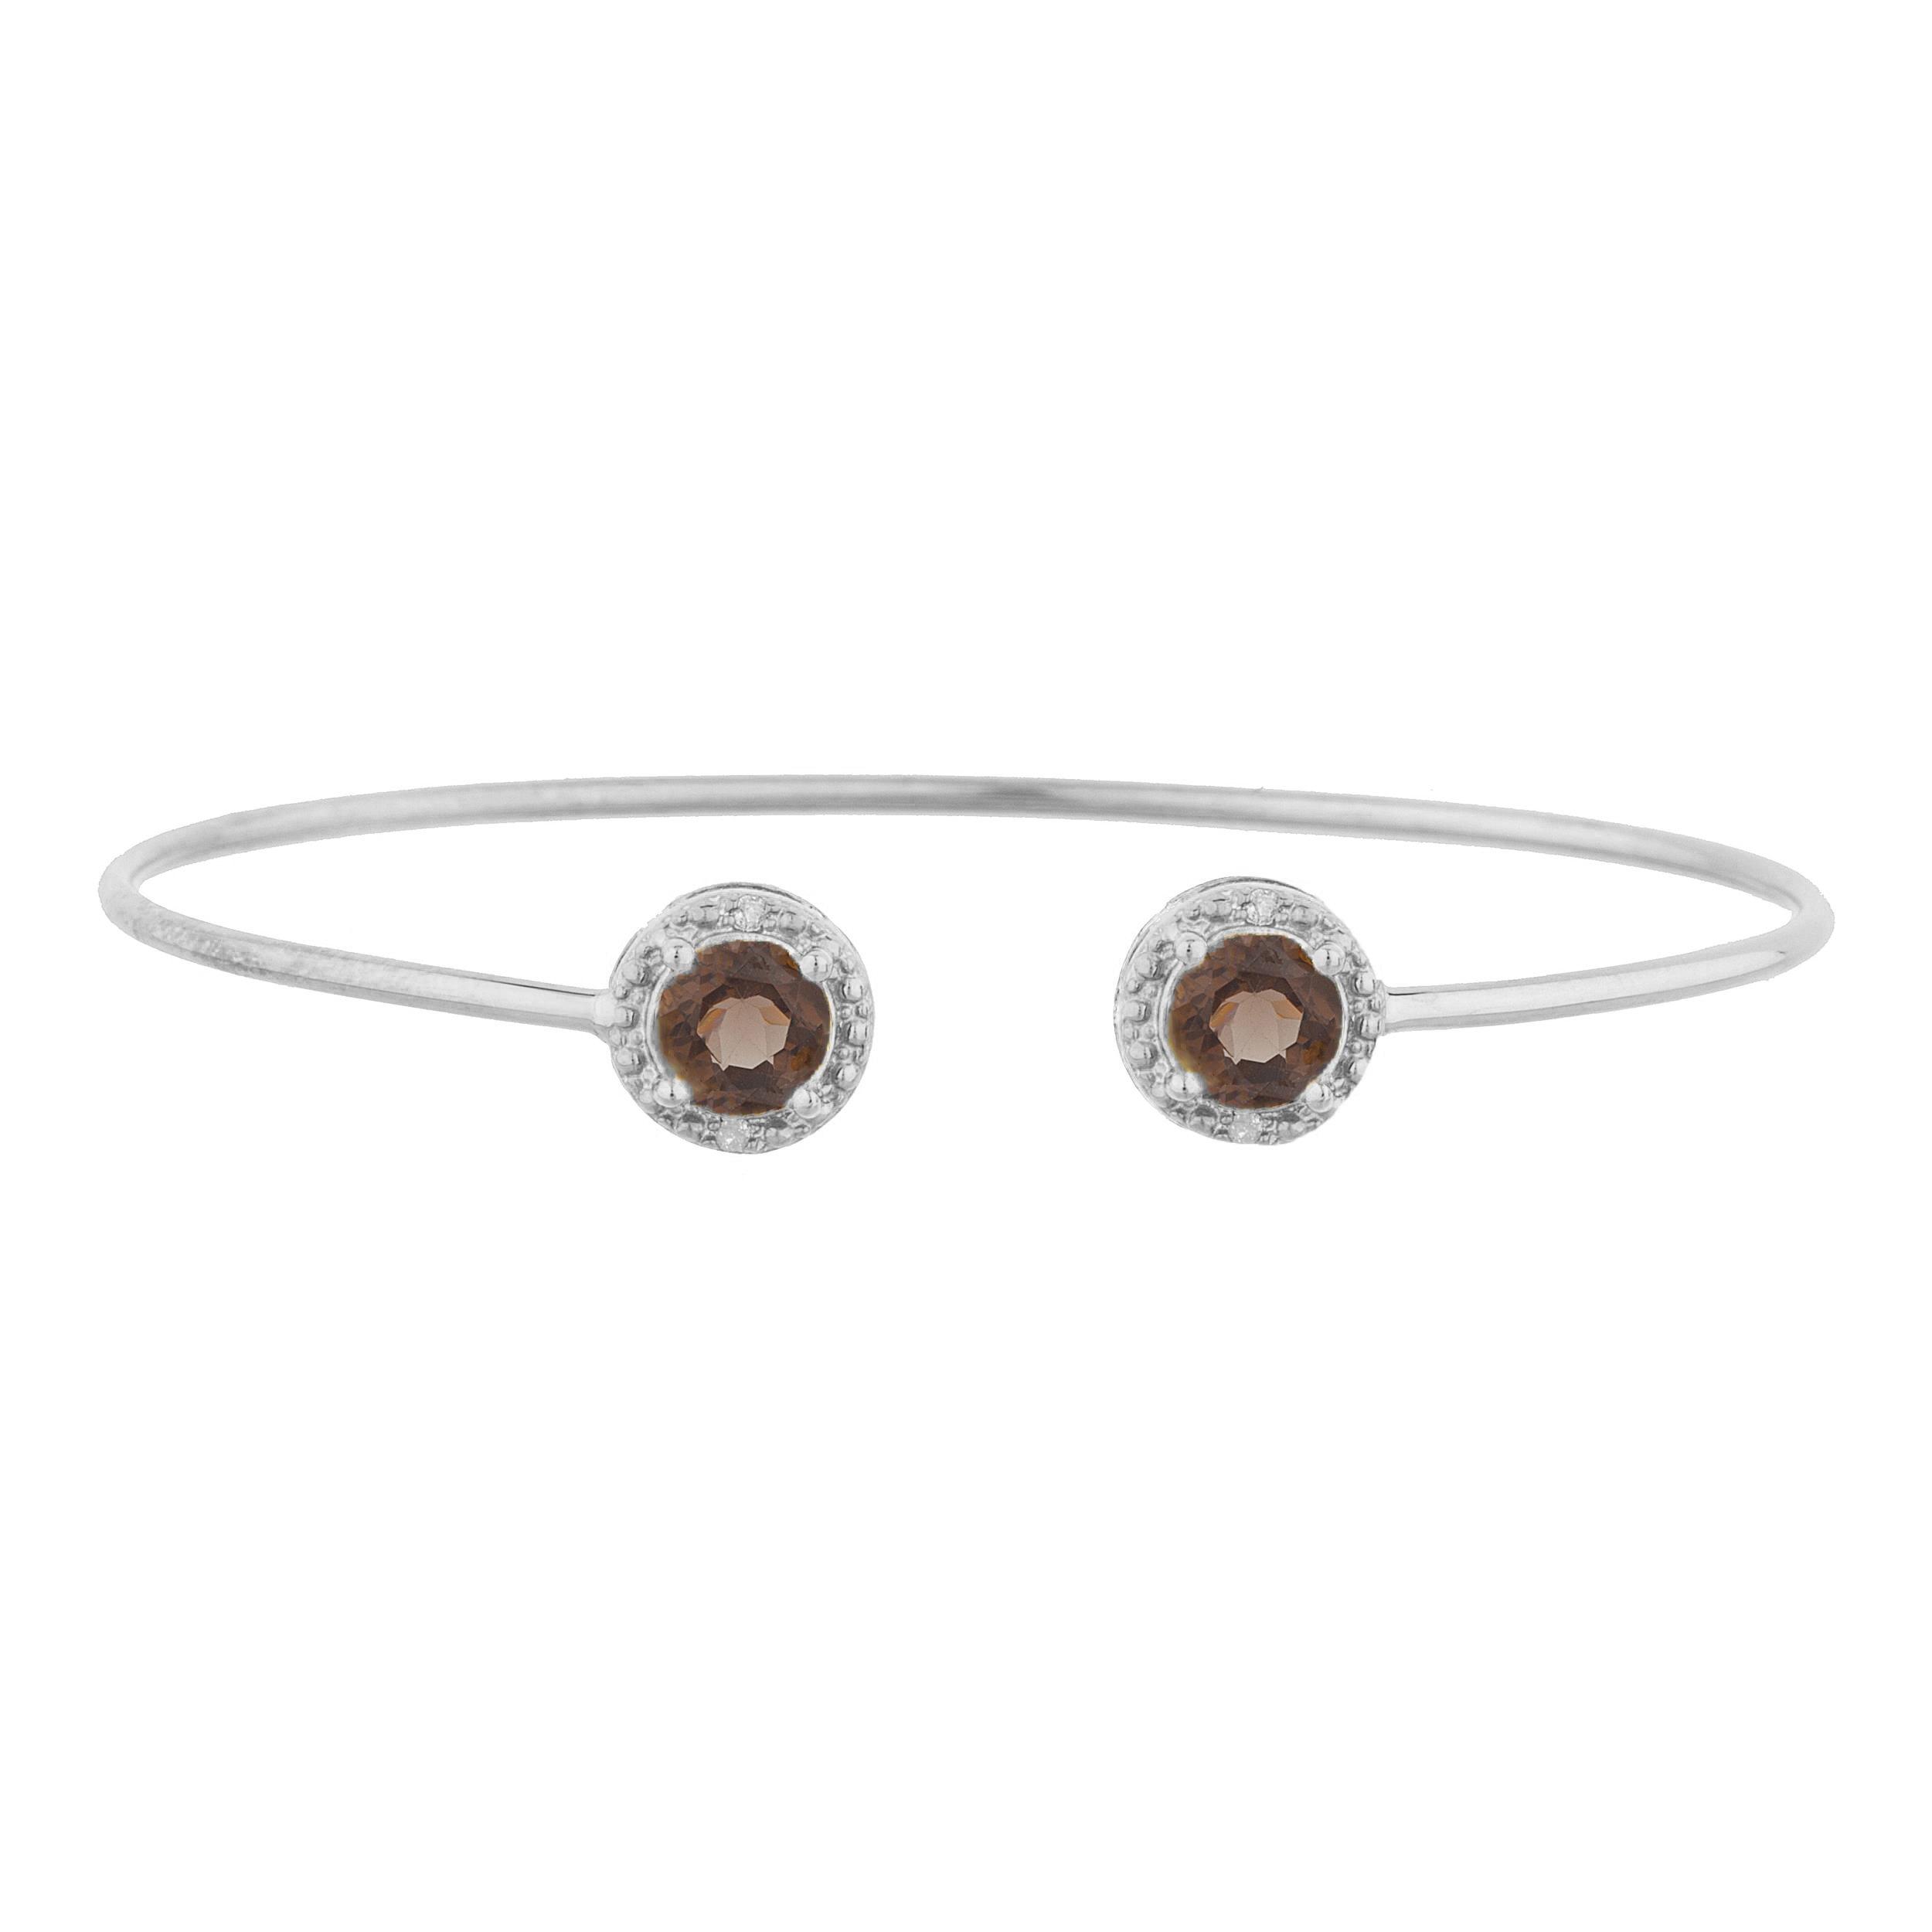 2 Ct Genuine Smoky Topaz & Diamond Round Bangle Bracelet .925 Sterling Silver by Elizabeth Jewelry Inc